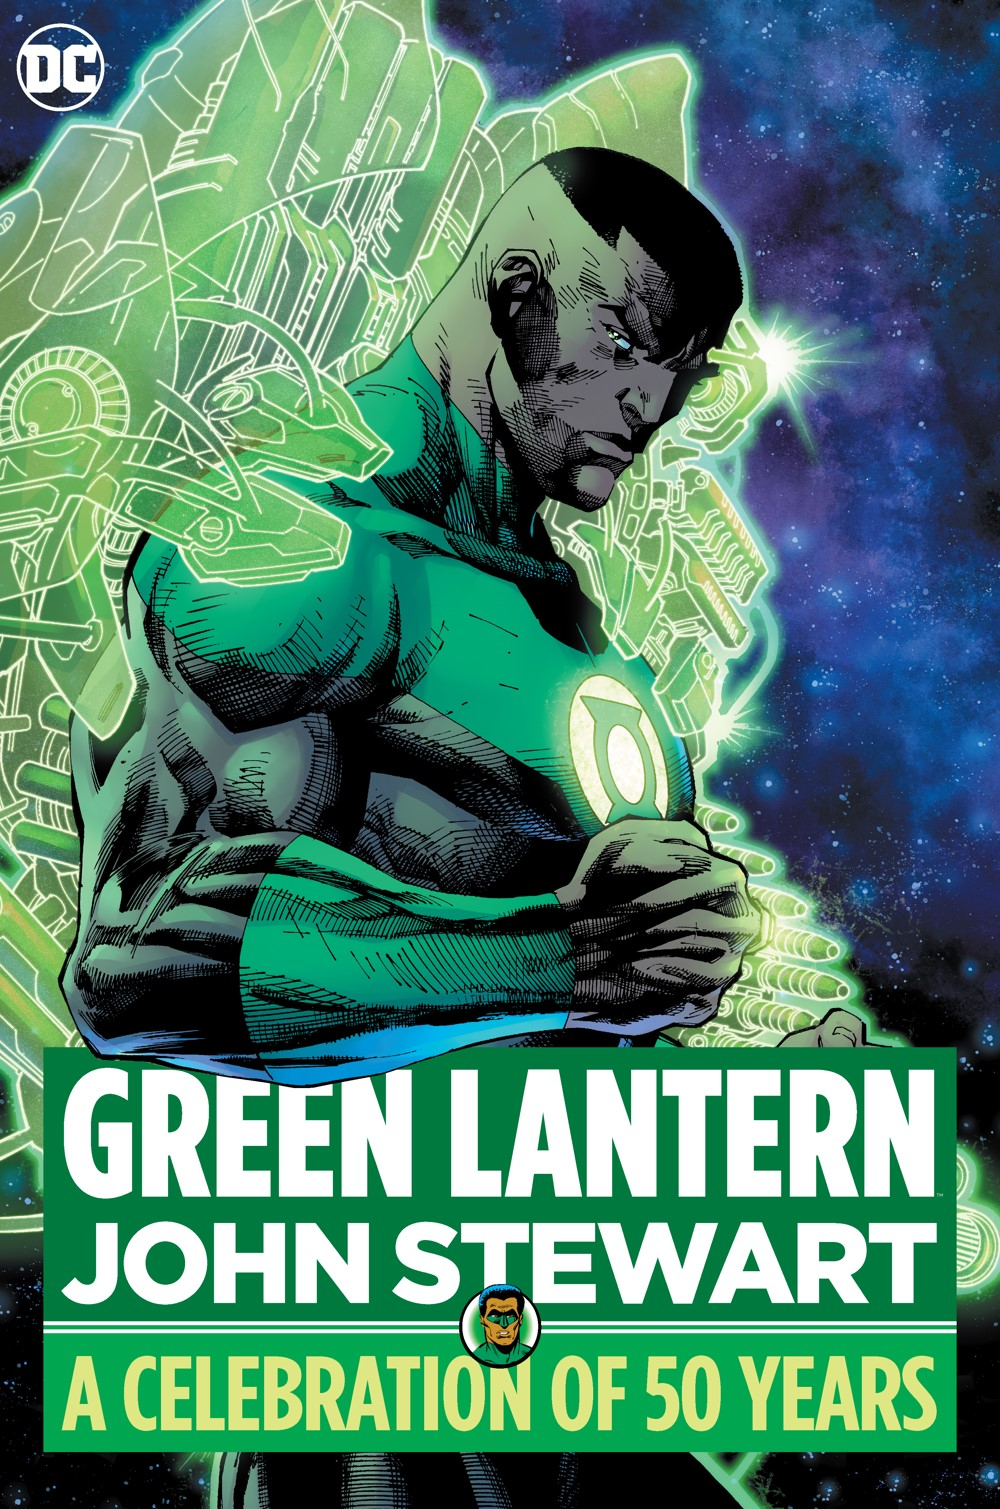 0321DC115-2 ComicList: DC Comics New Releases for 06/23/2021